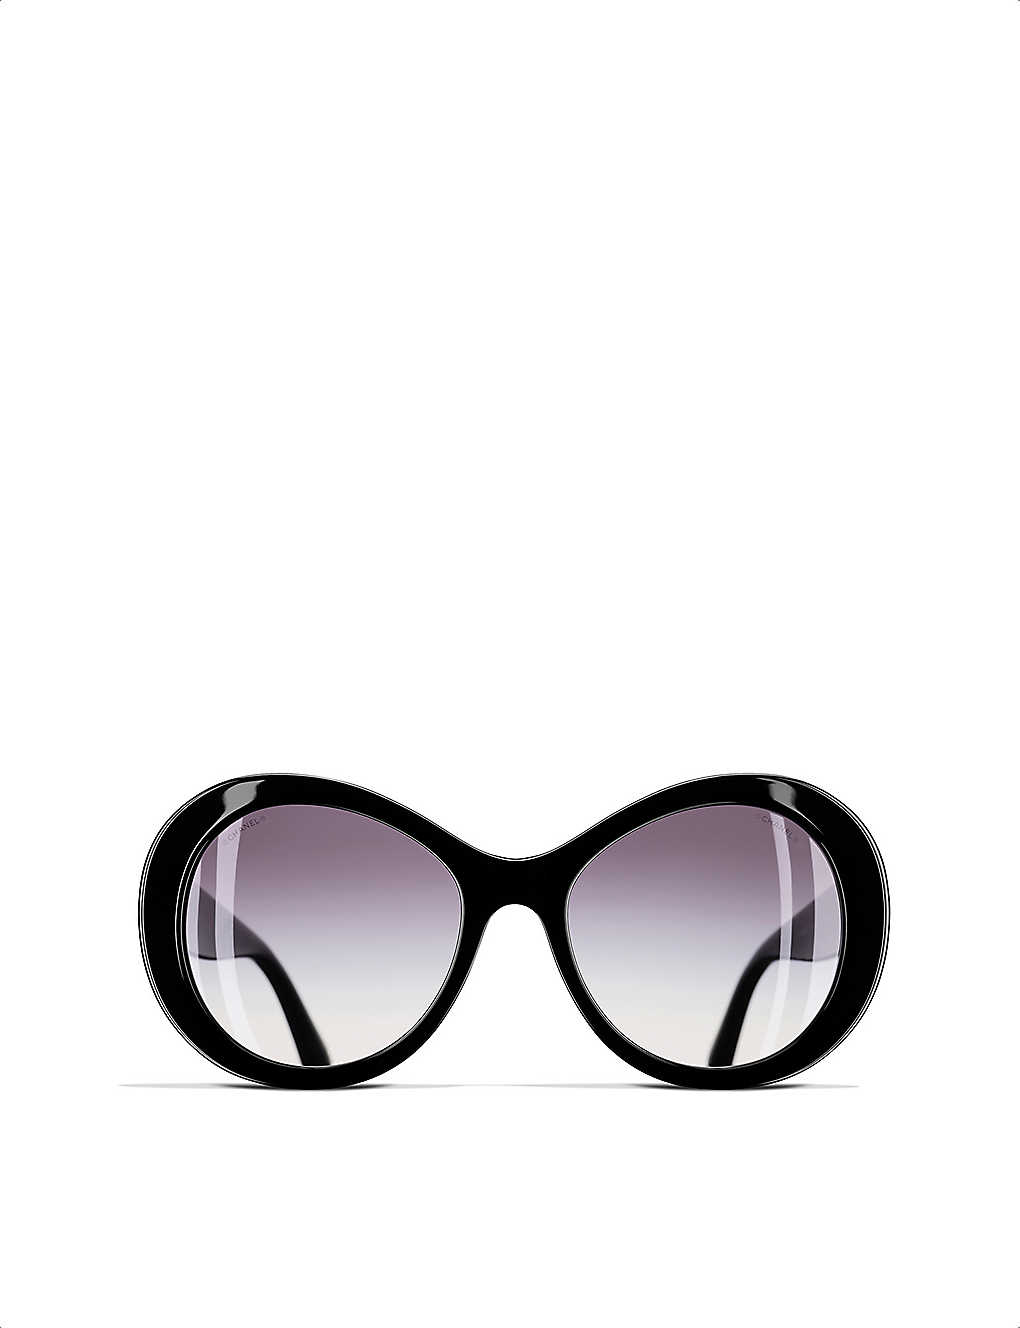 53f0b4308a569 CHANEL - Oval sunglasses